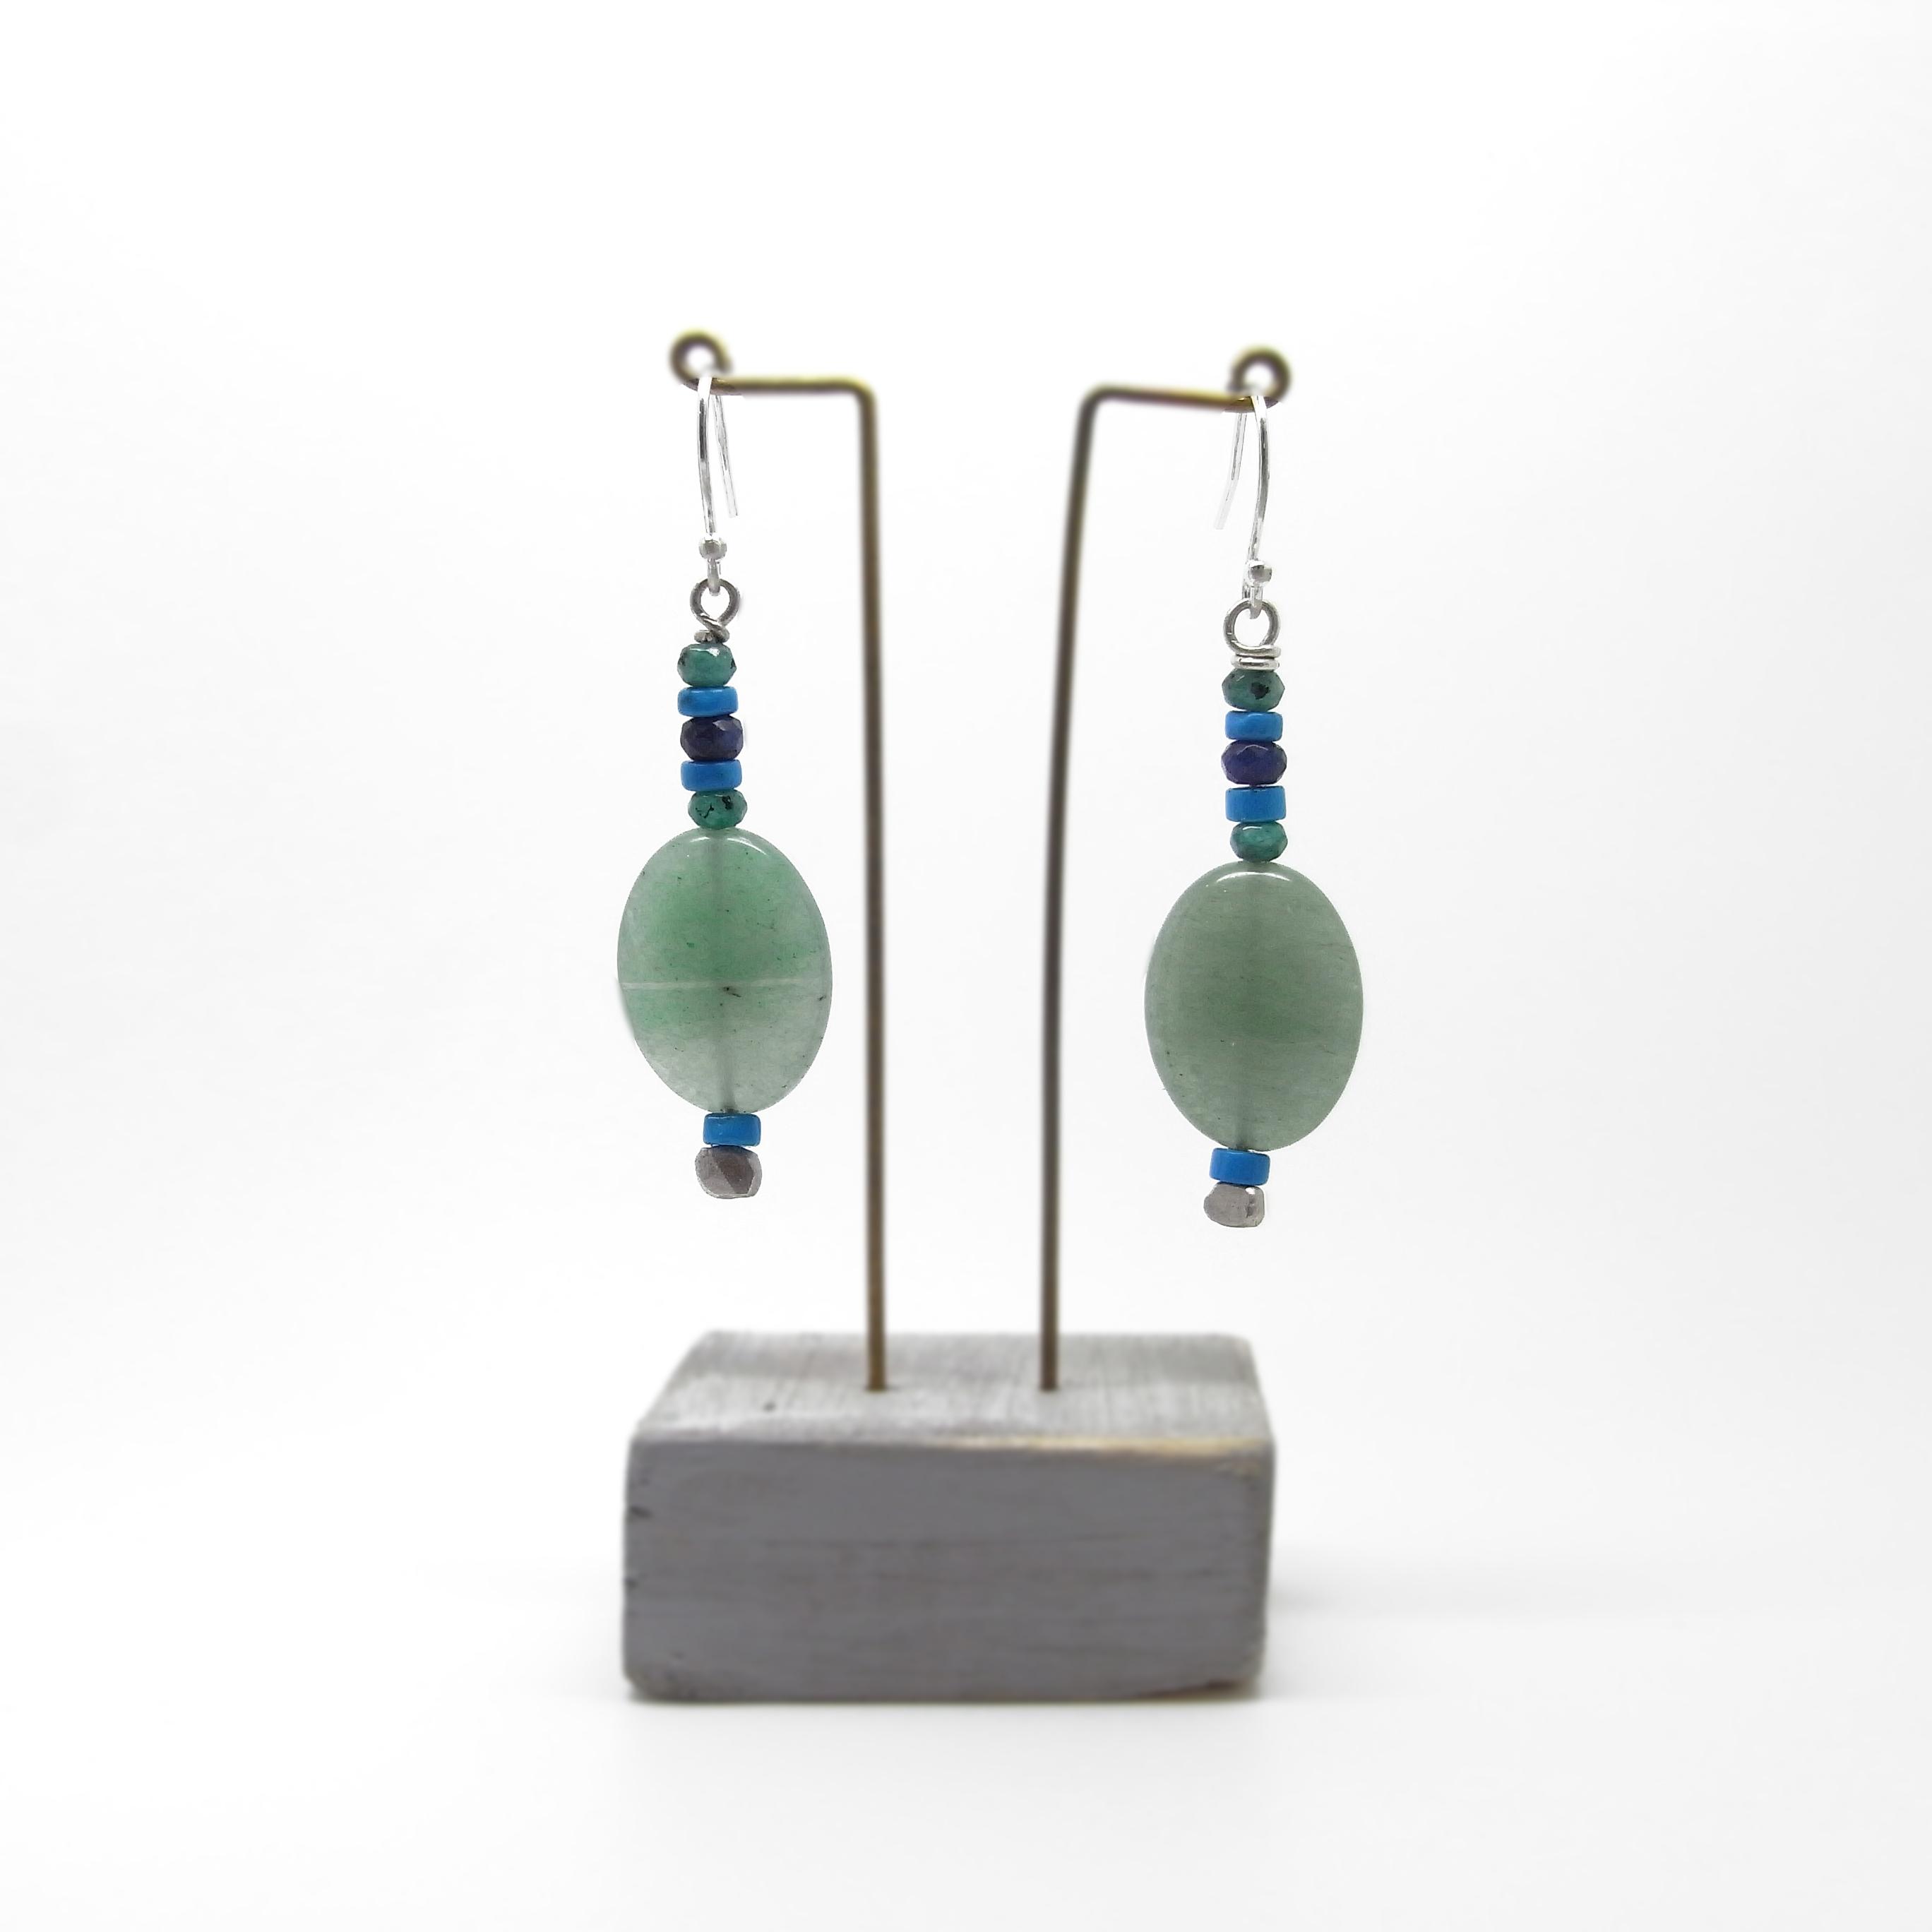 SALE - Aventurine and Green Quartz Bead Earrings